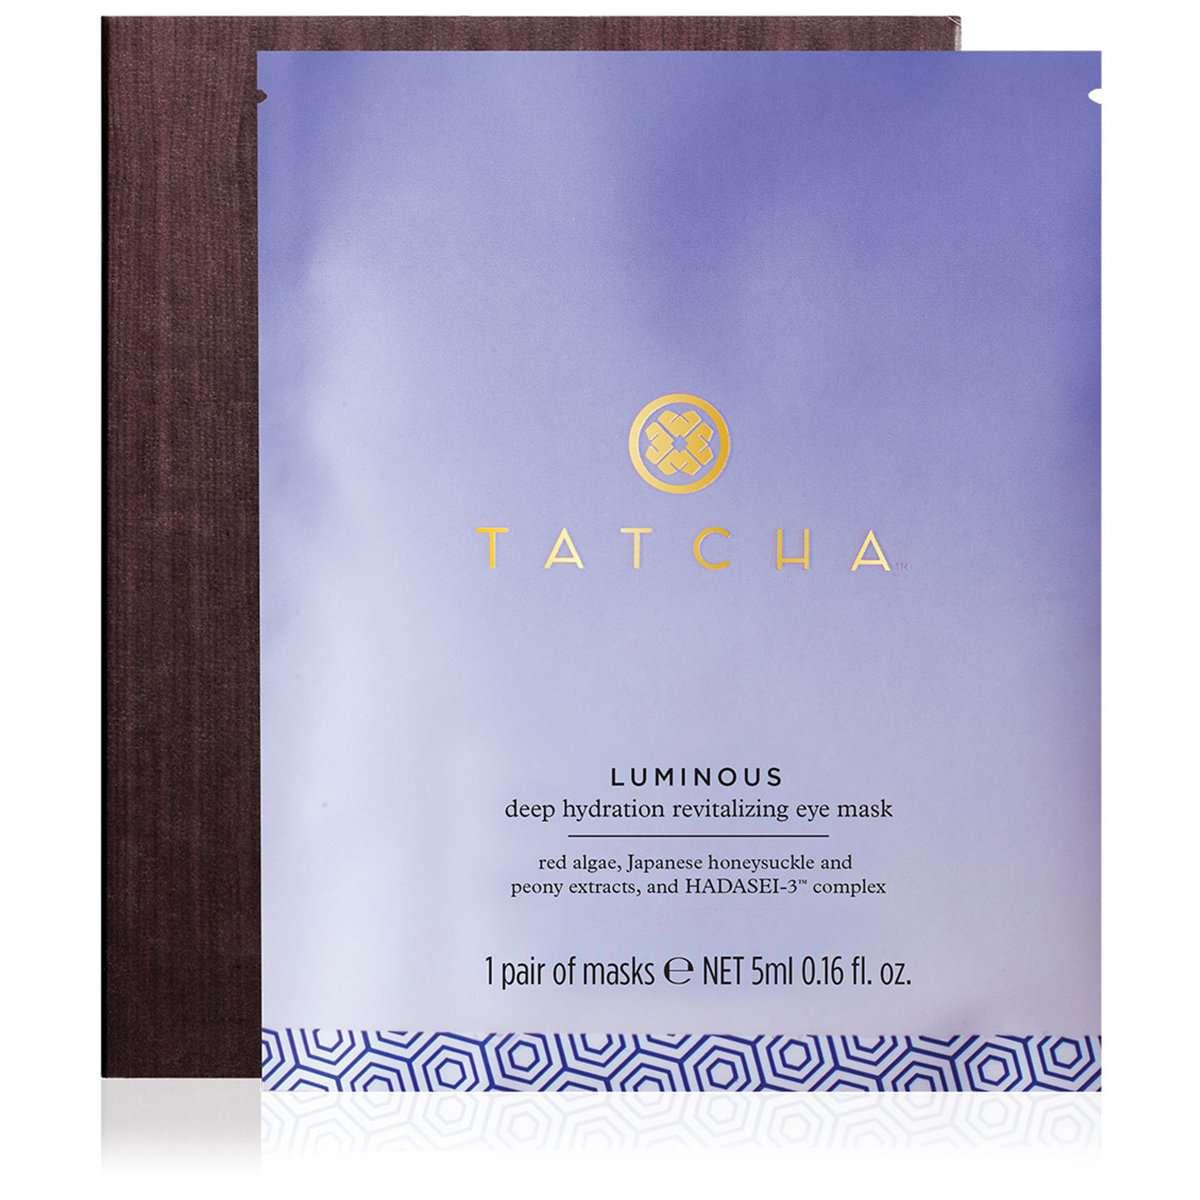 Tatcha Luminous Deep Hydration Revitalizing Eye Mask, 10 pack